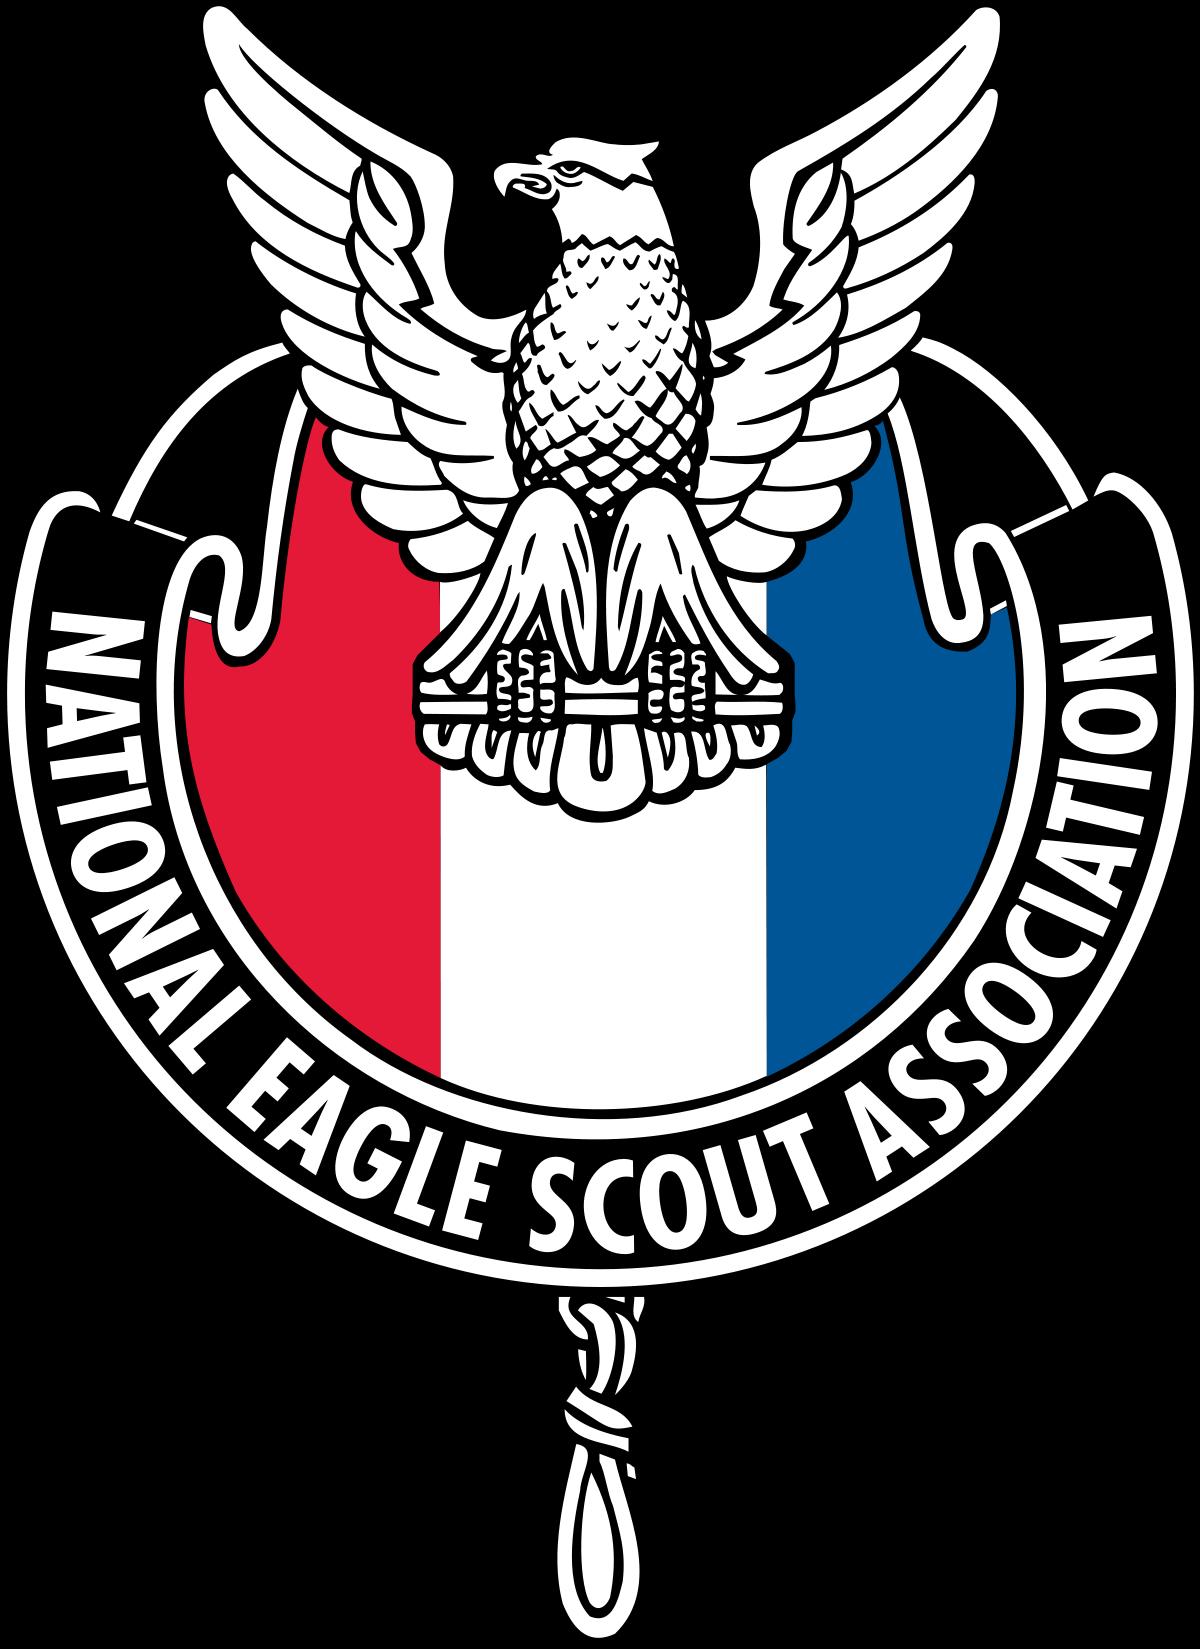 NationalEagleScoutAssociation